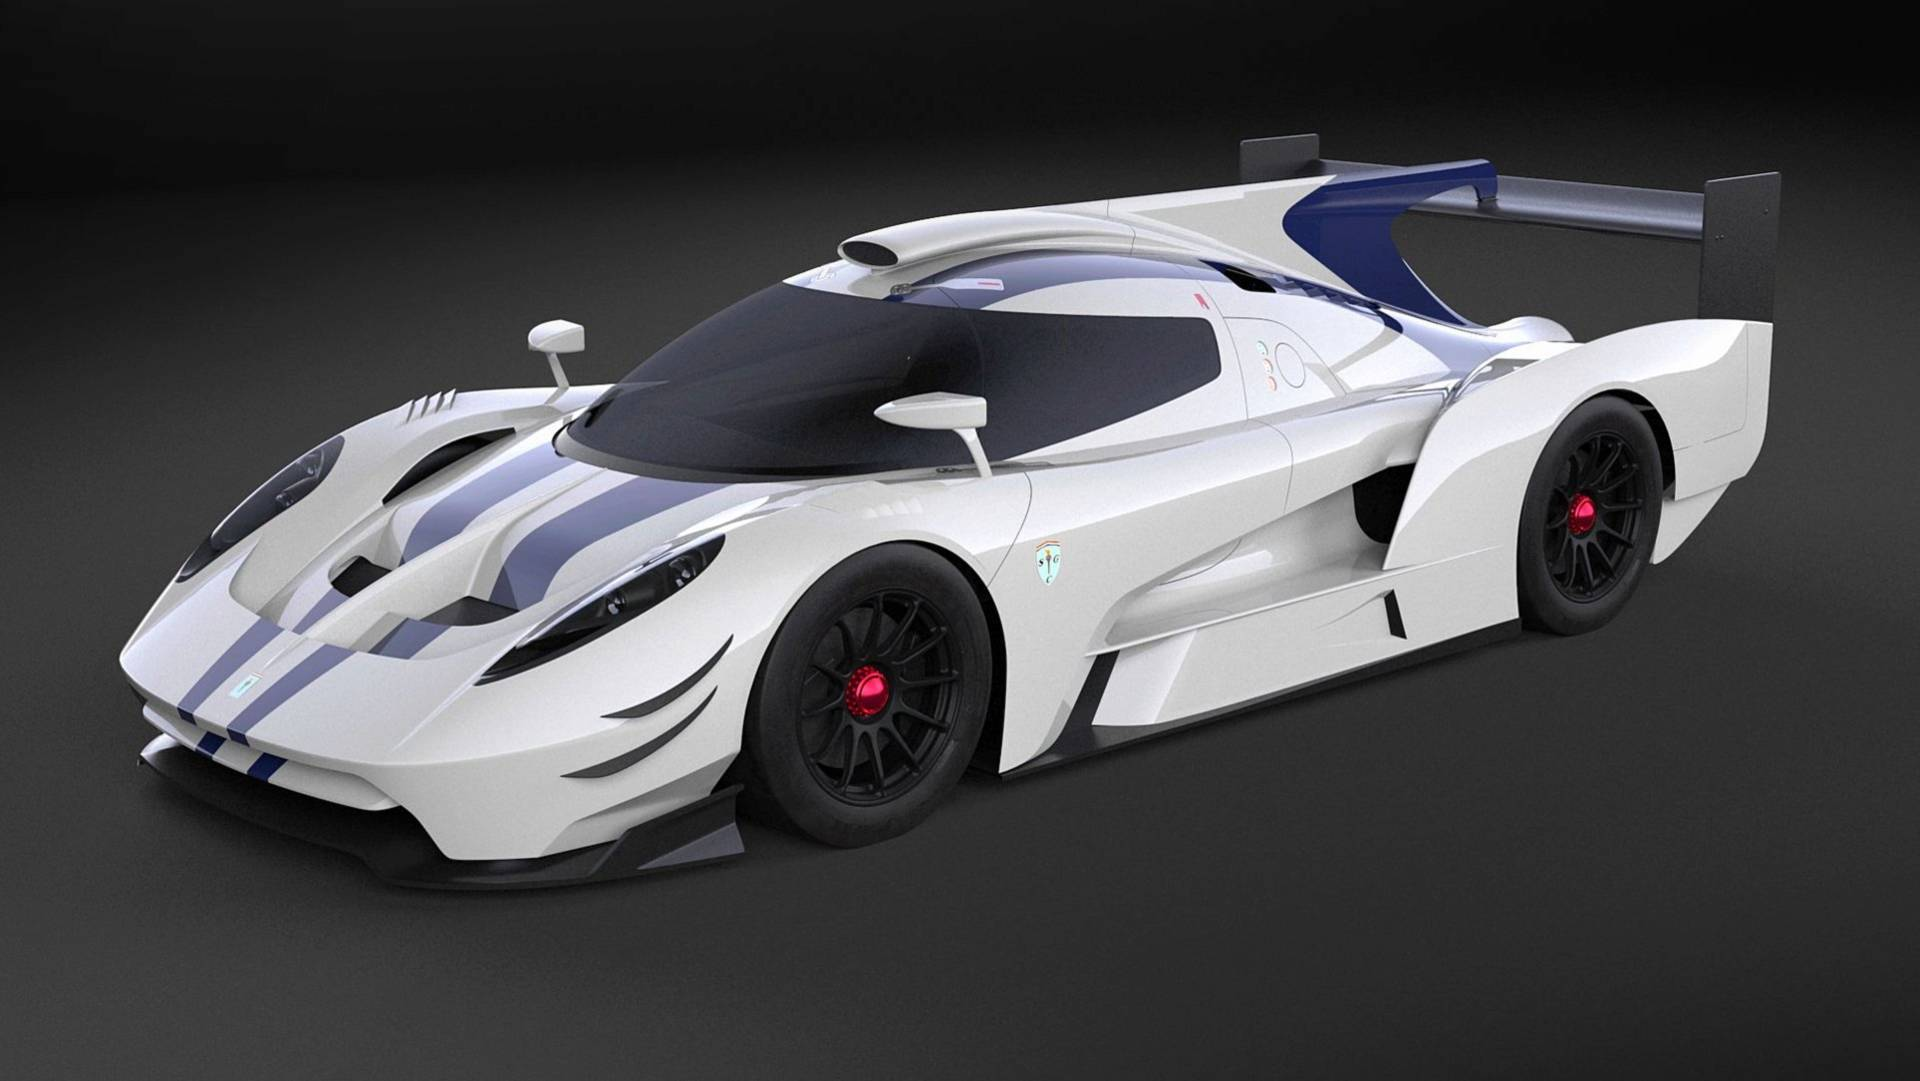 Topgear Koenigsegg Considering Le Mans Entry In 2020